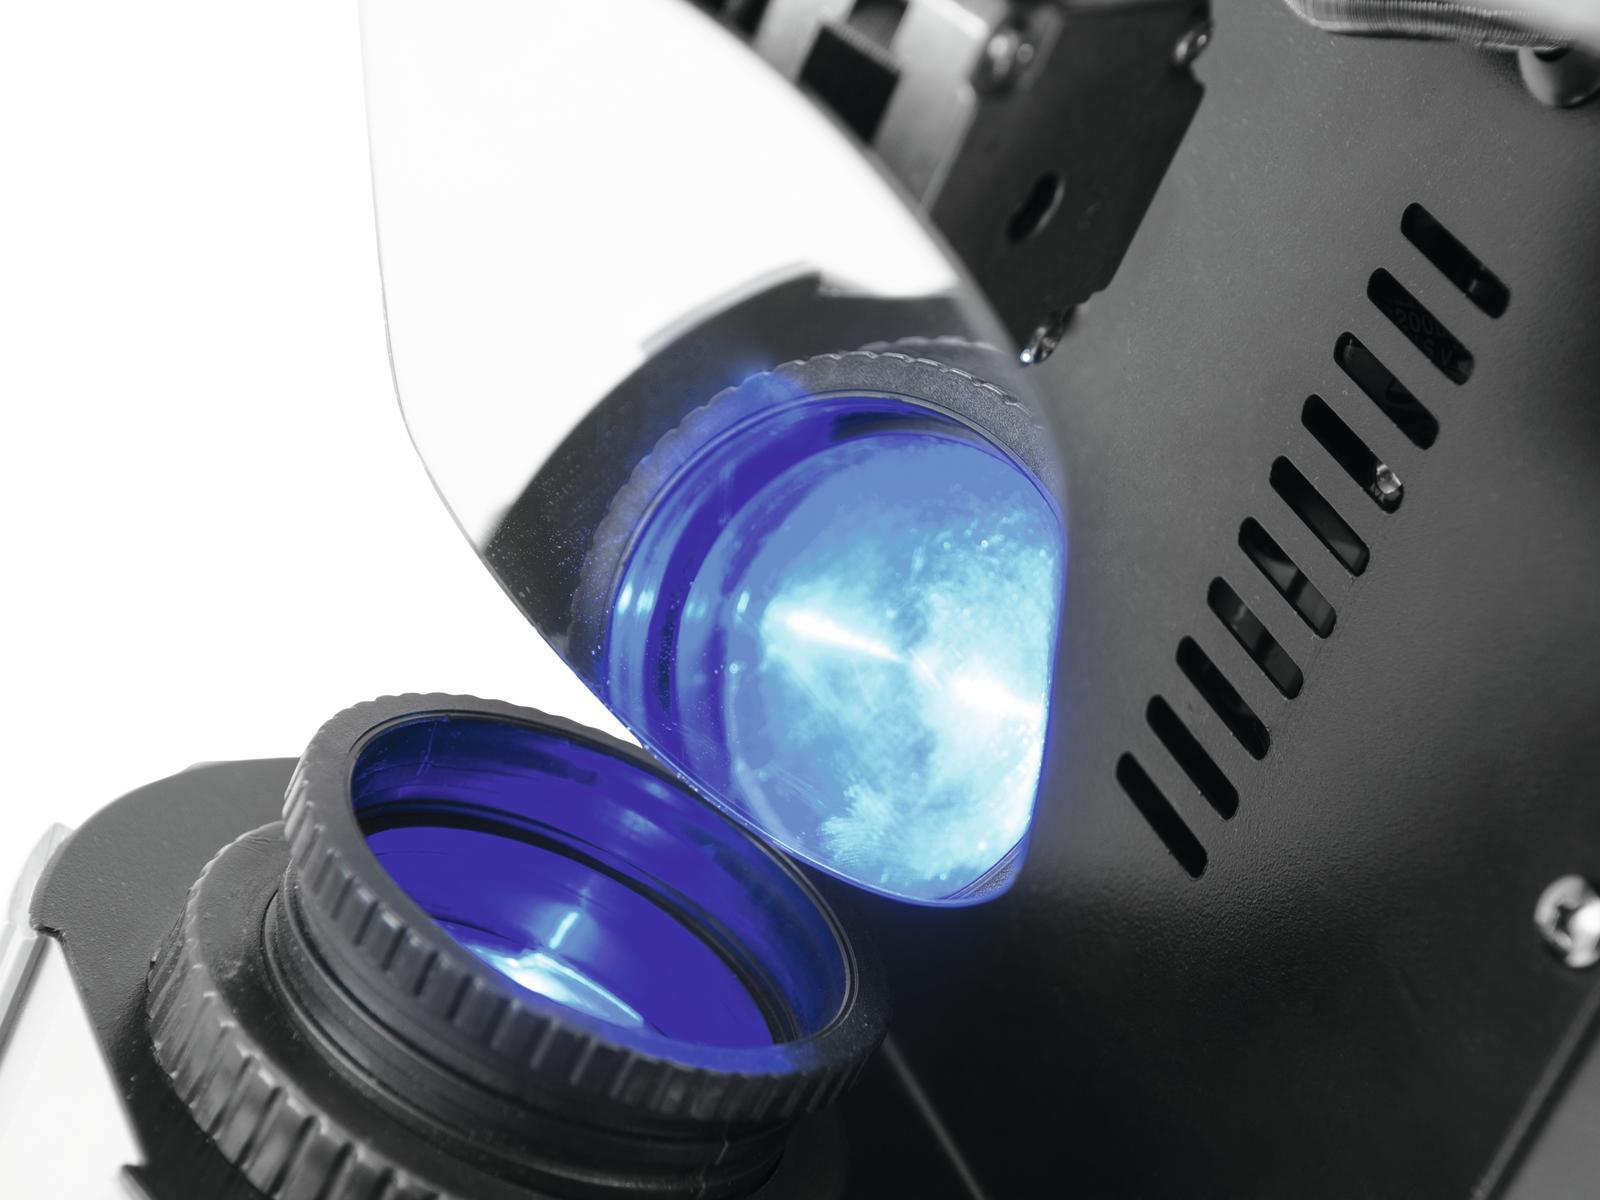 EUROLITE LED PST-10 QLC Scansione Luce